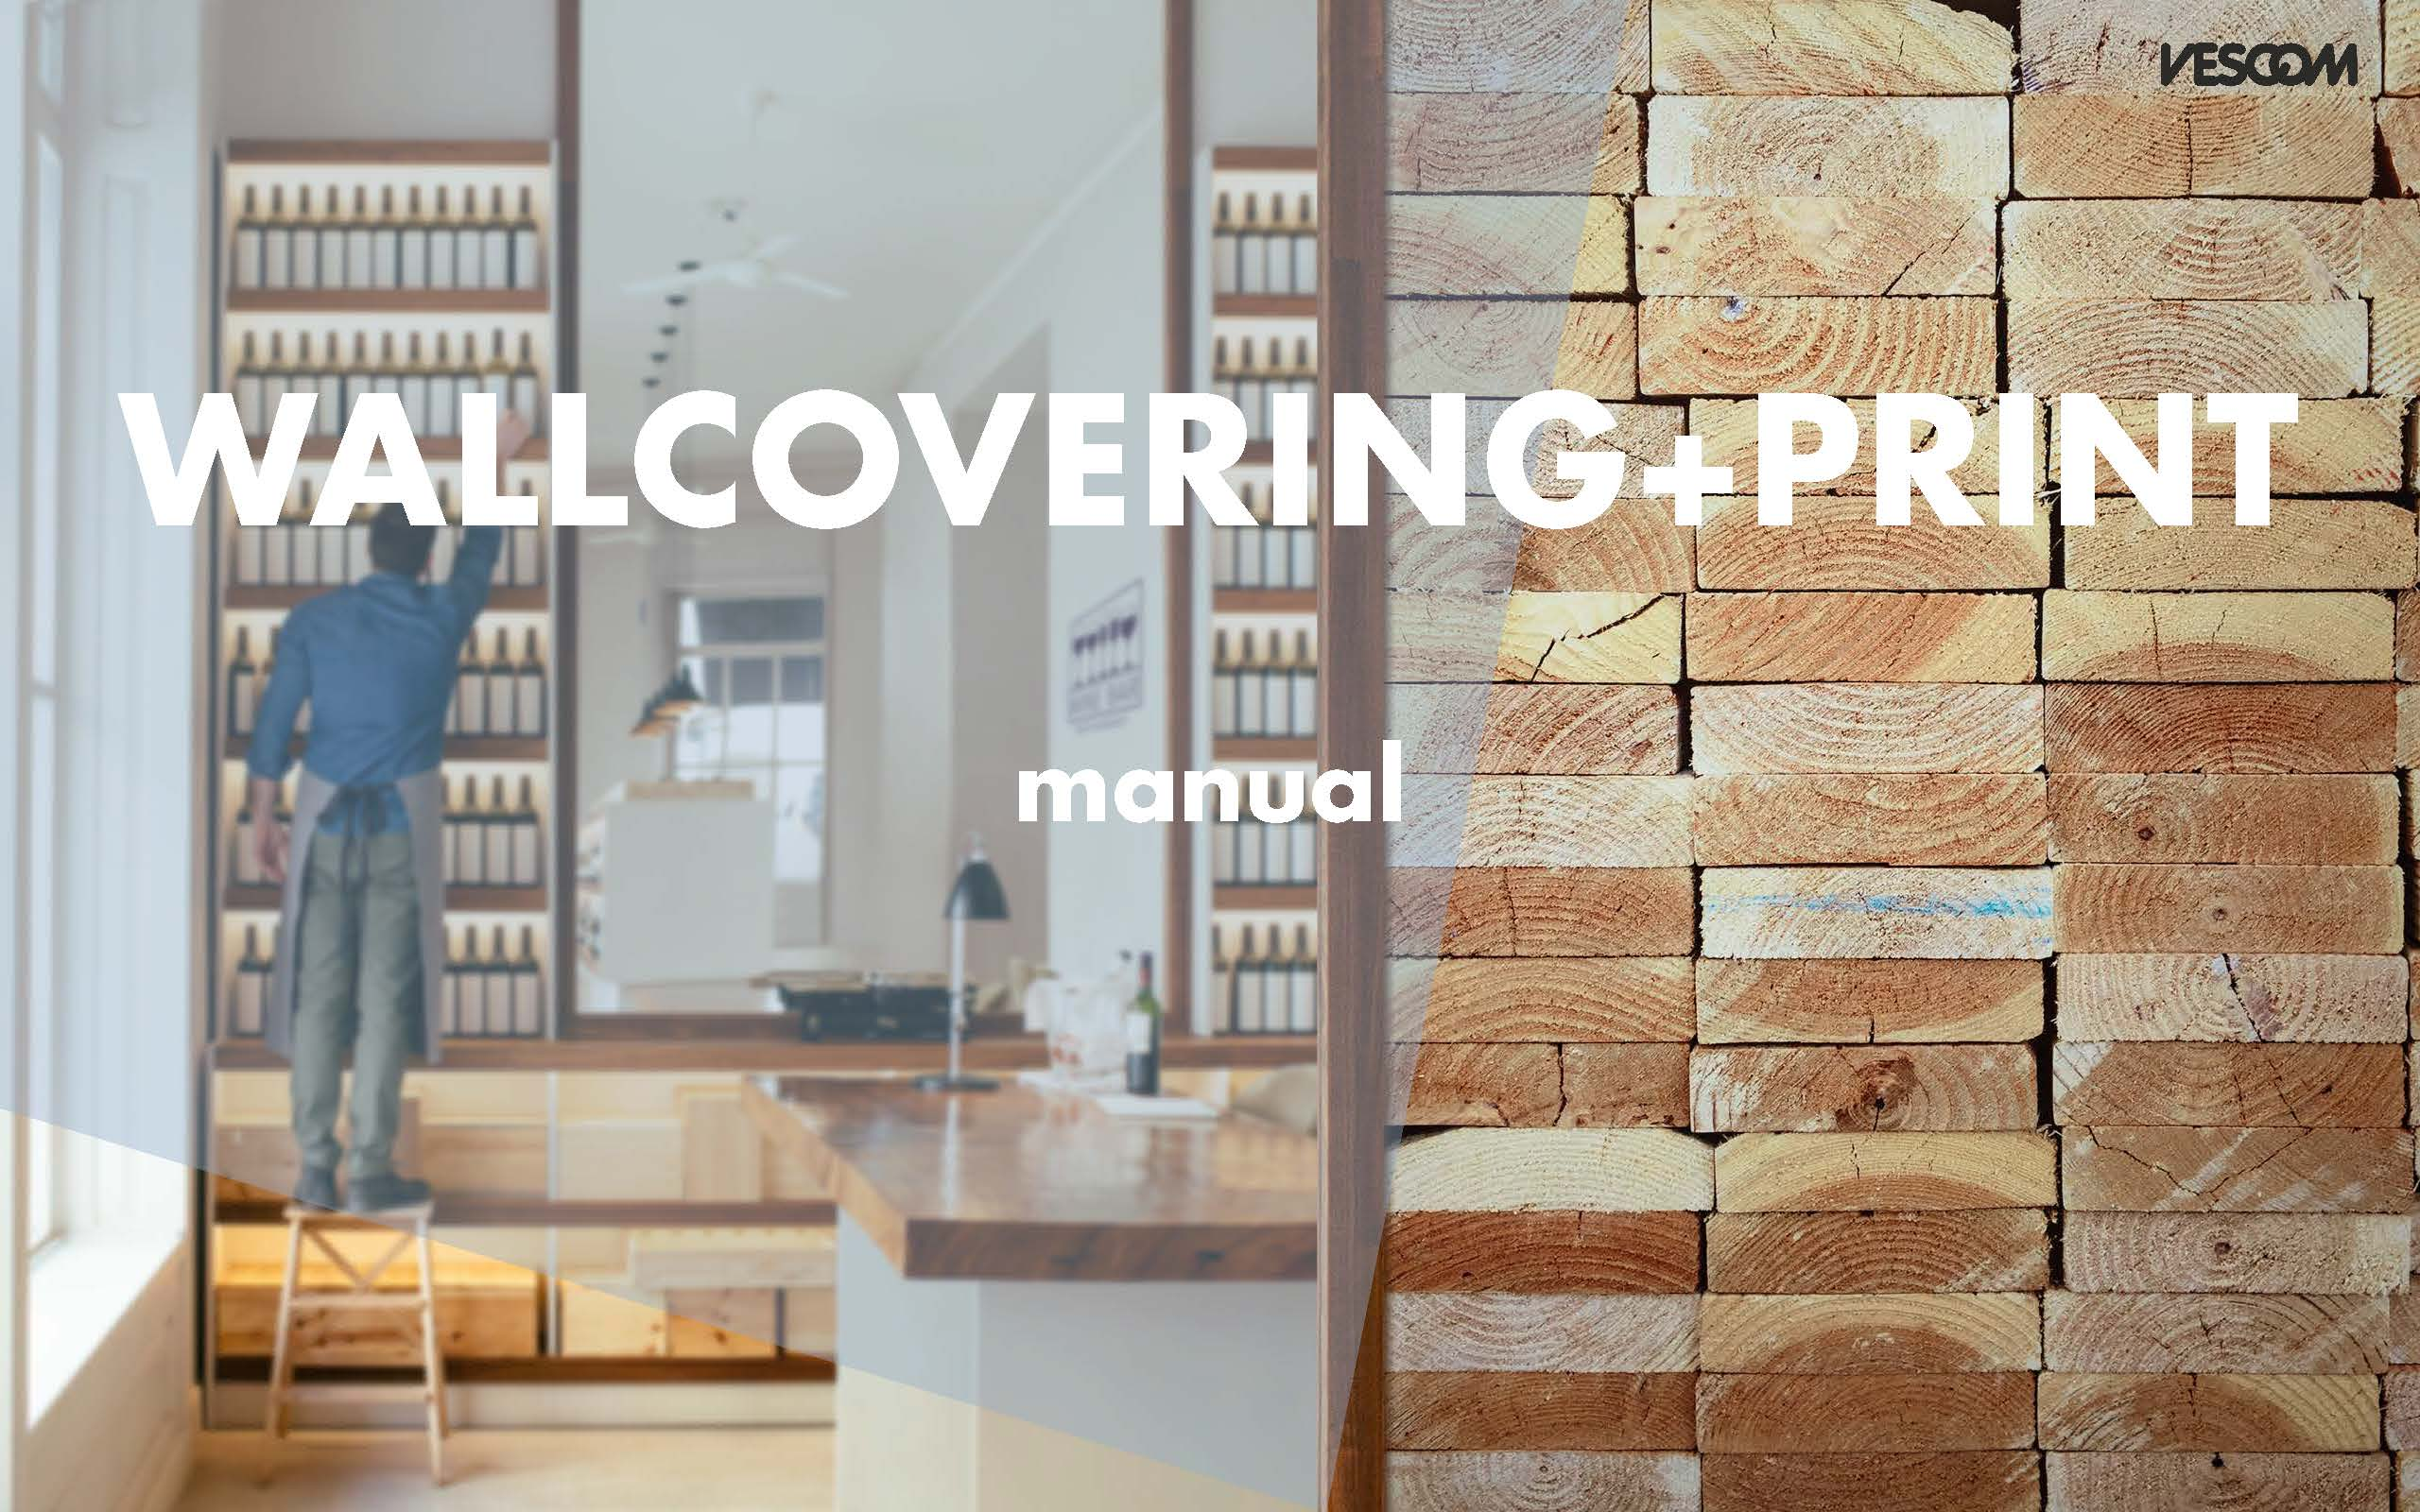 Voorzijde Wallcovering+Print manual - EN